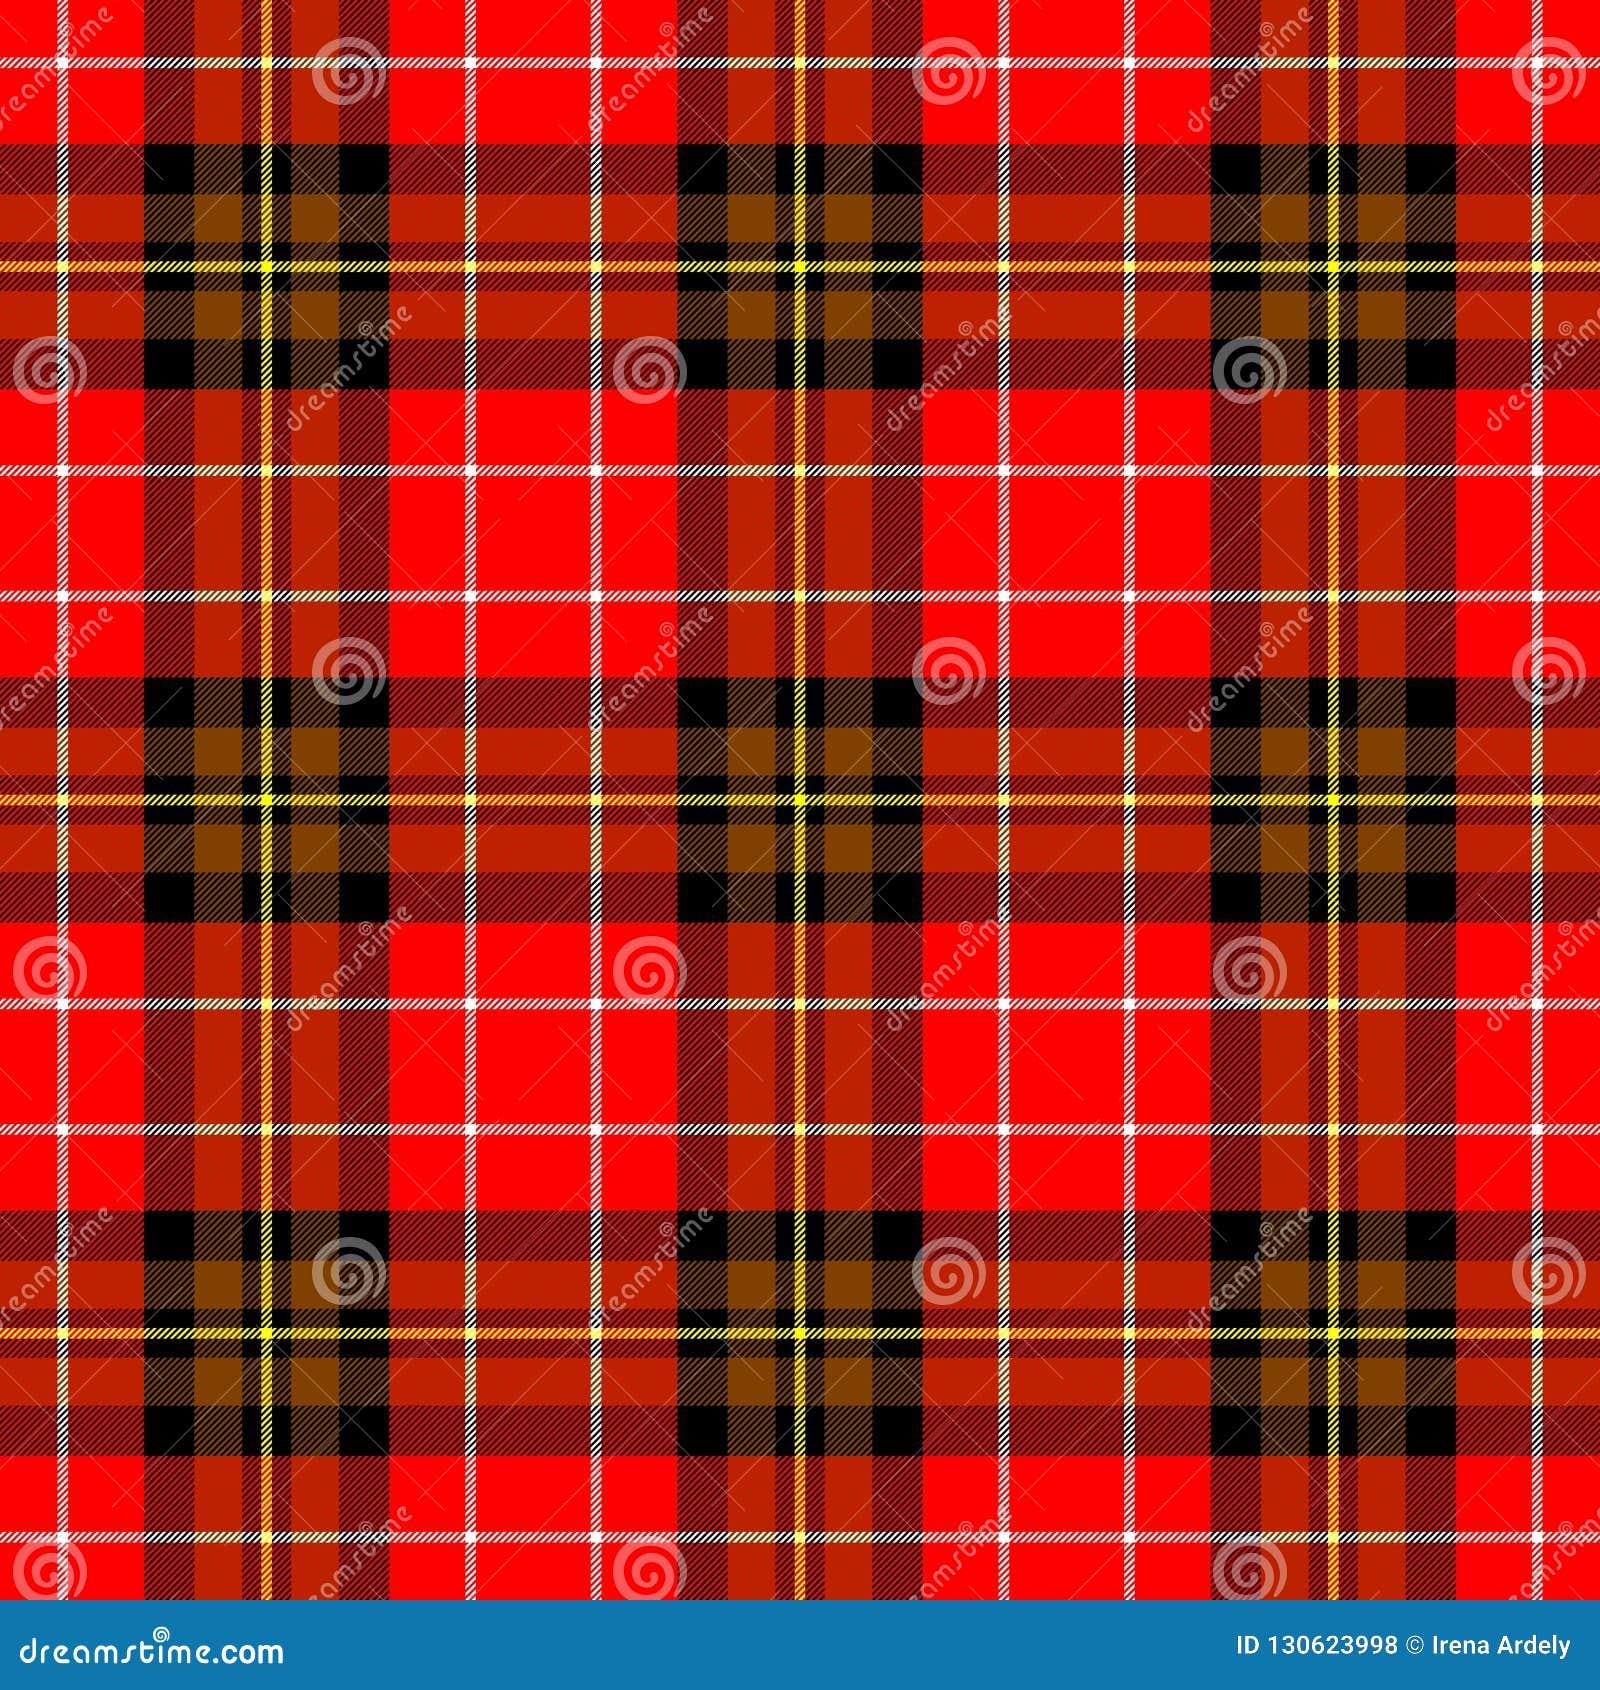 Diamond Tartan Plaid Scotch Kilt Fabric Seamless Pattern